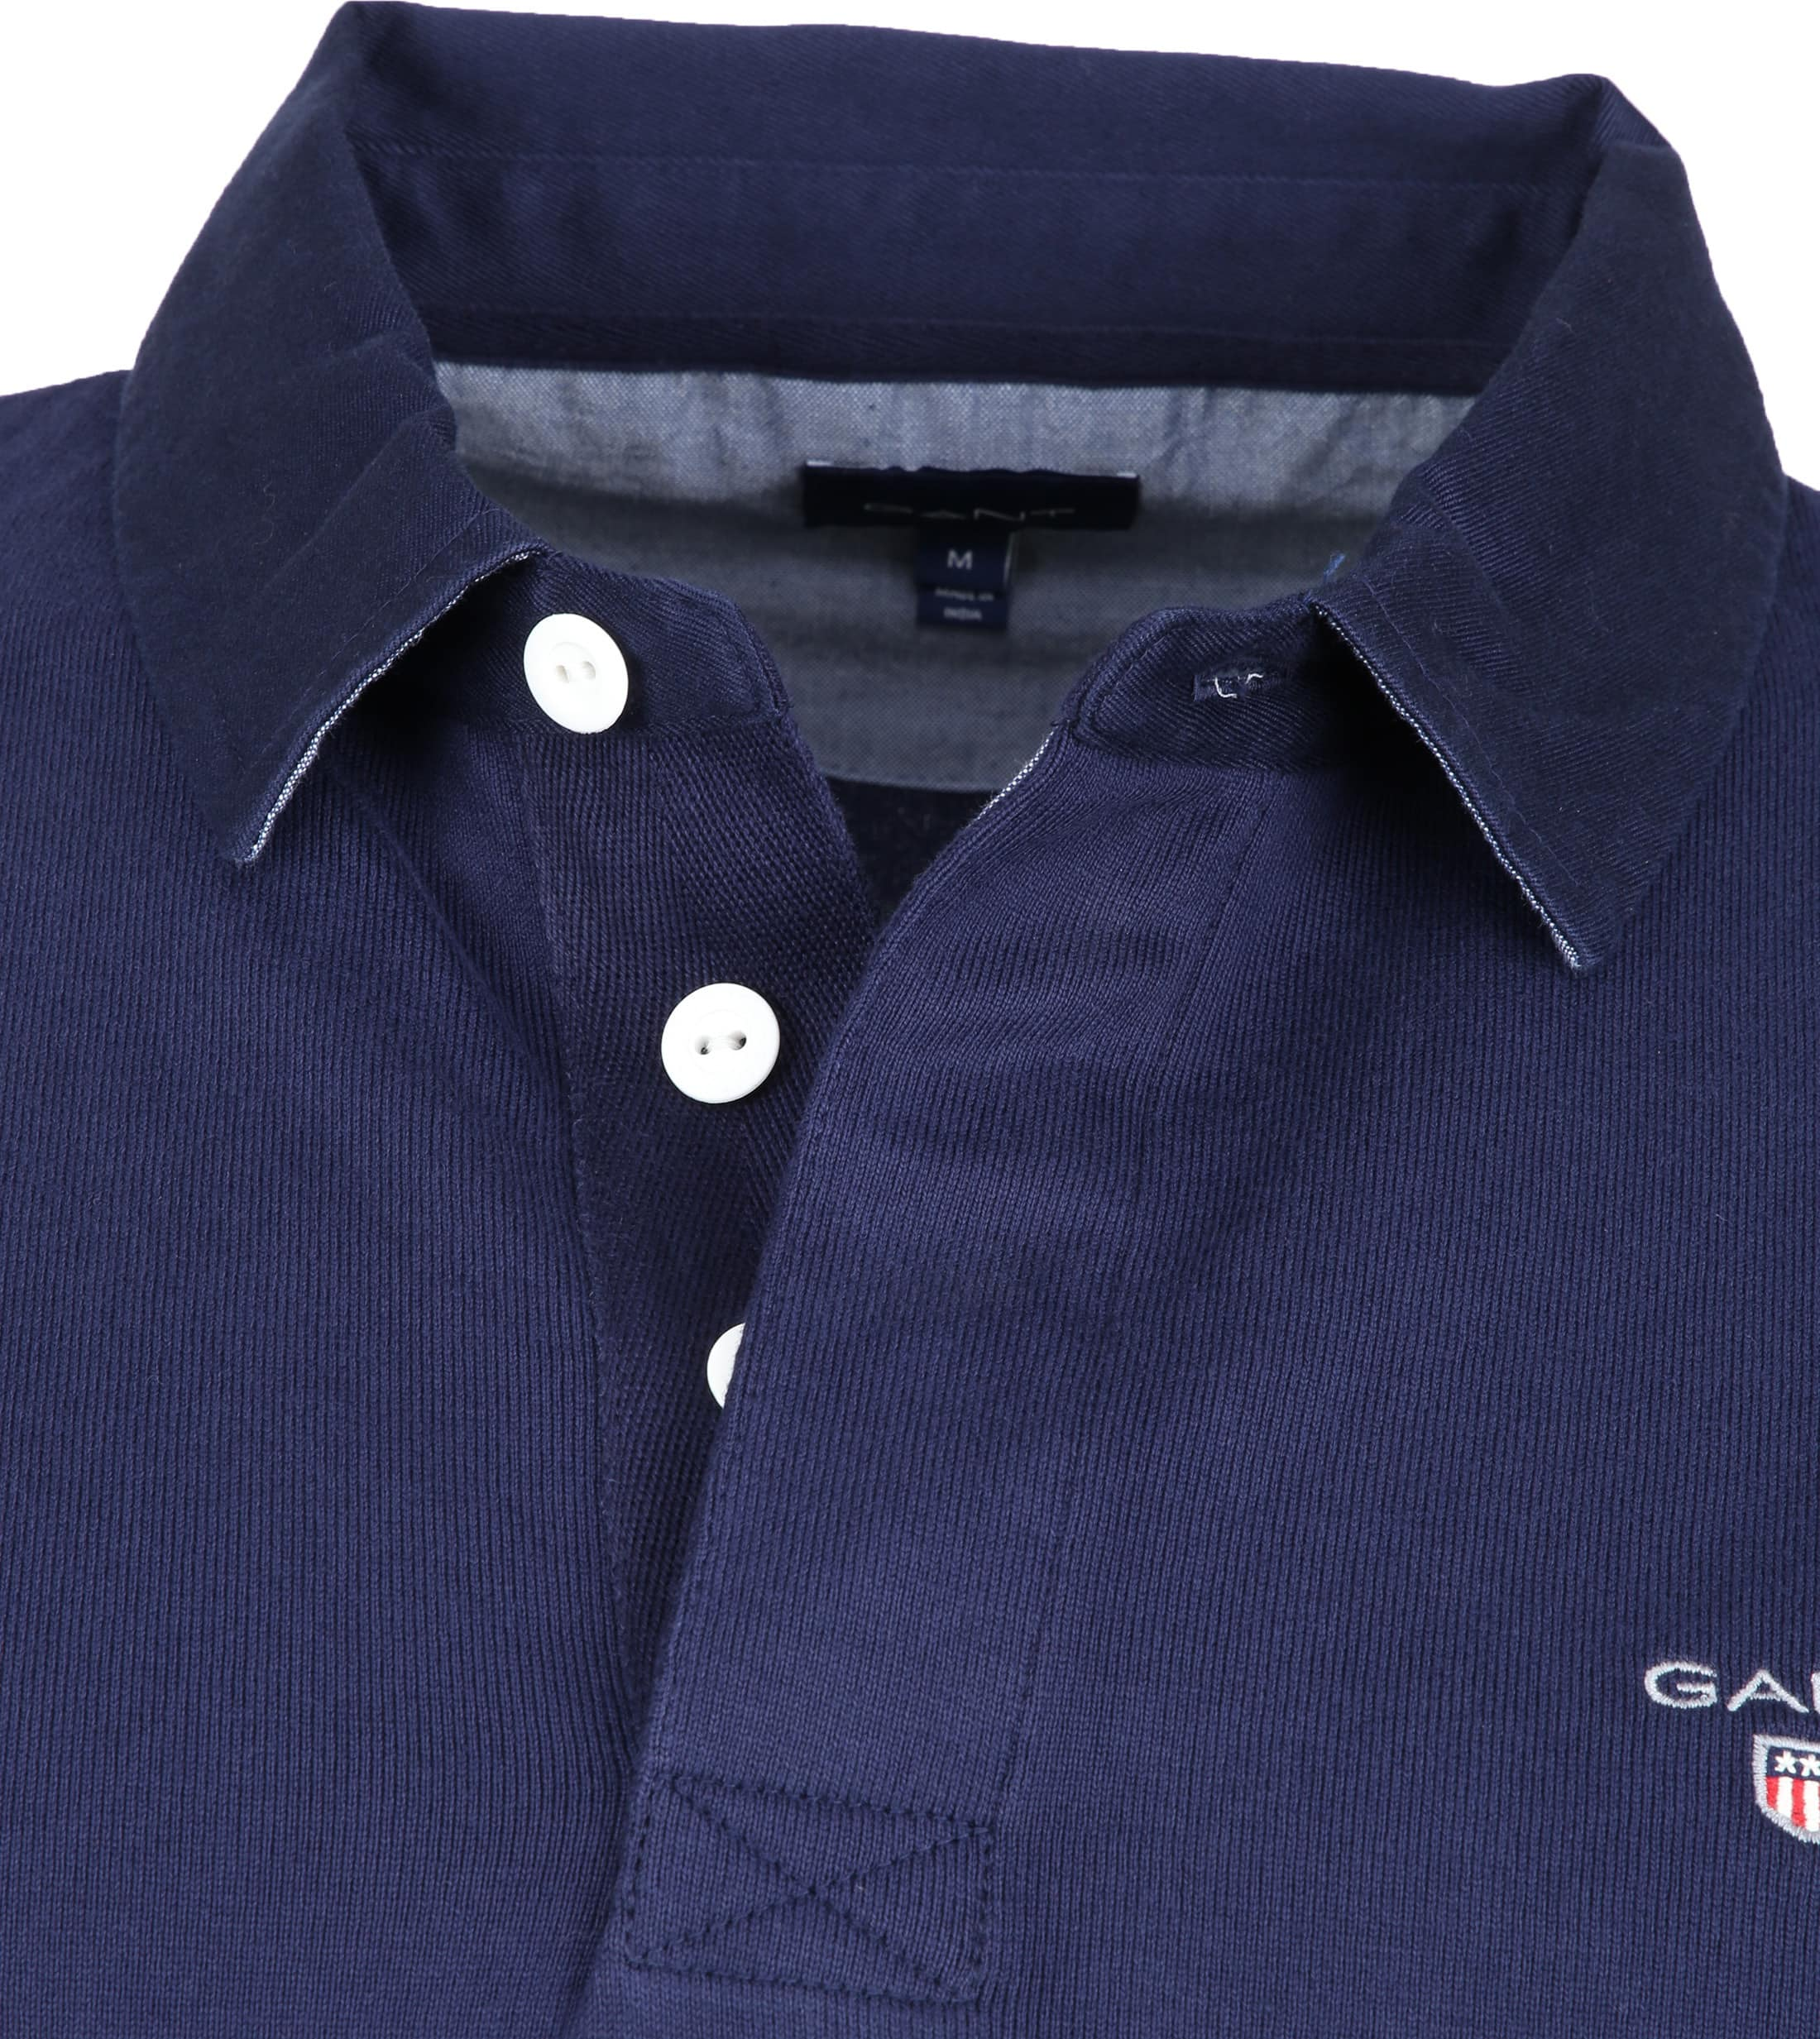 Gant Rugger Poloshirt LS Navy foto 1